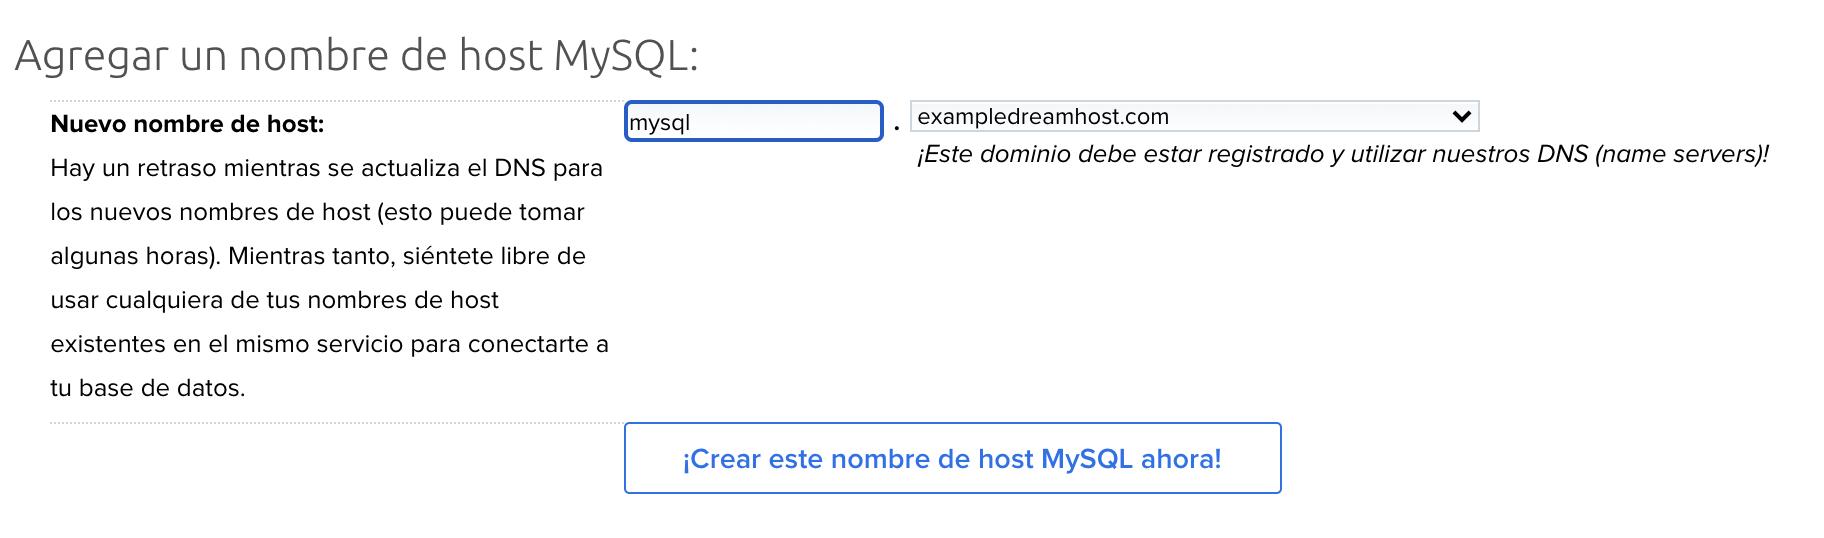 es-panel-manage-domain-wp-hosting-04.png